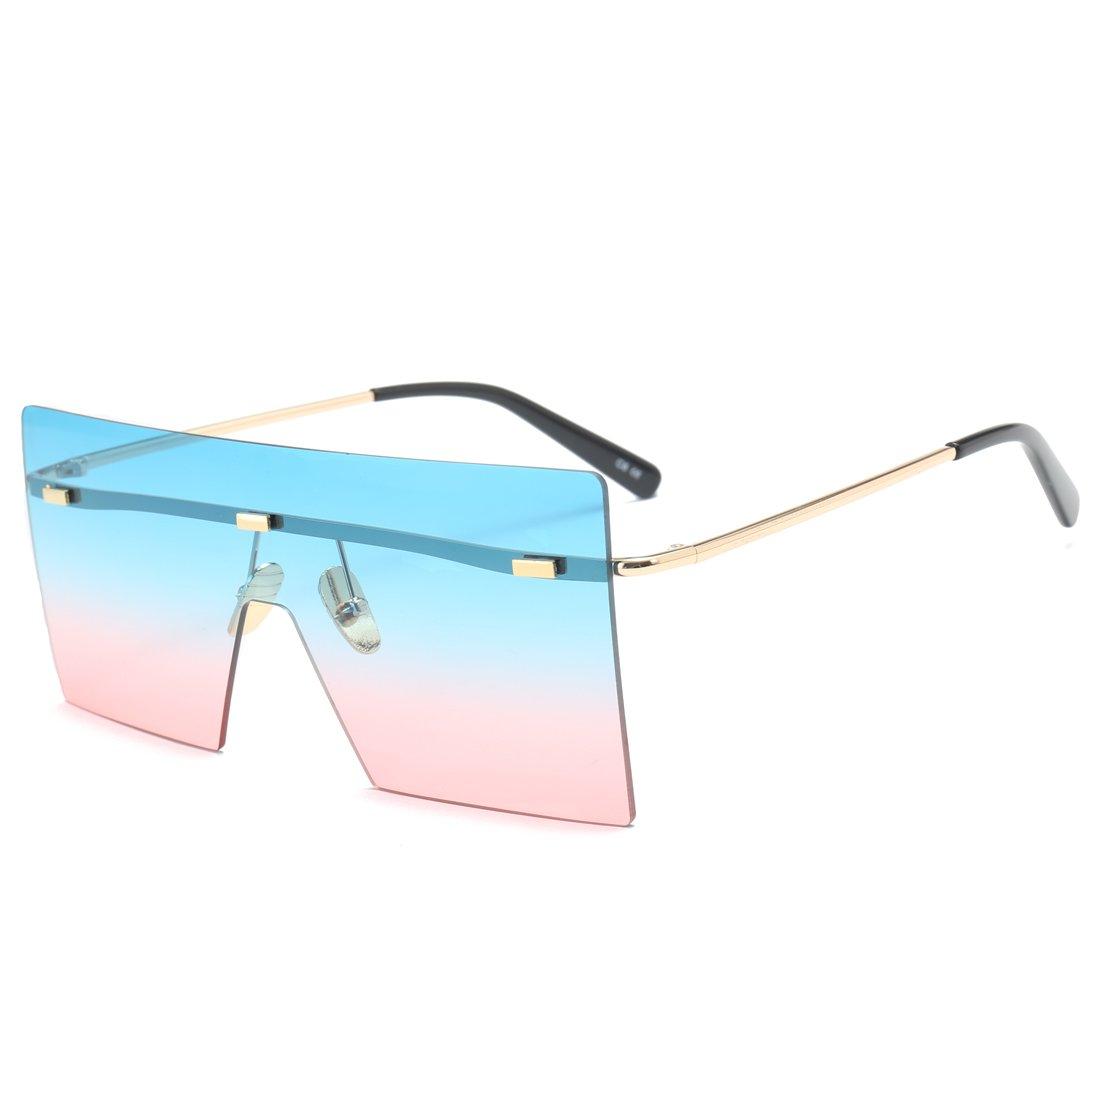 SIKYGEUM Vintange Oversized Rimless Sqaure Sunglasses Women Men Flat Top Mirrored (C6 Blue&Pink)